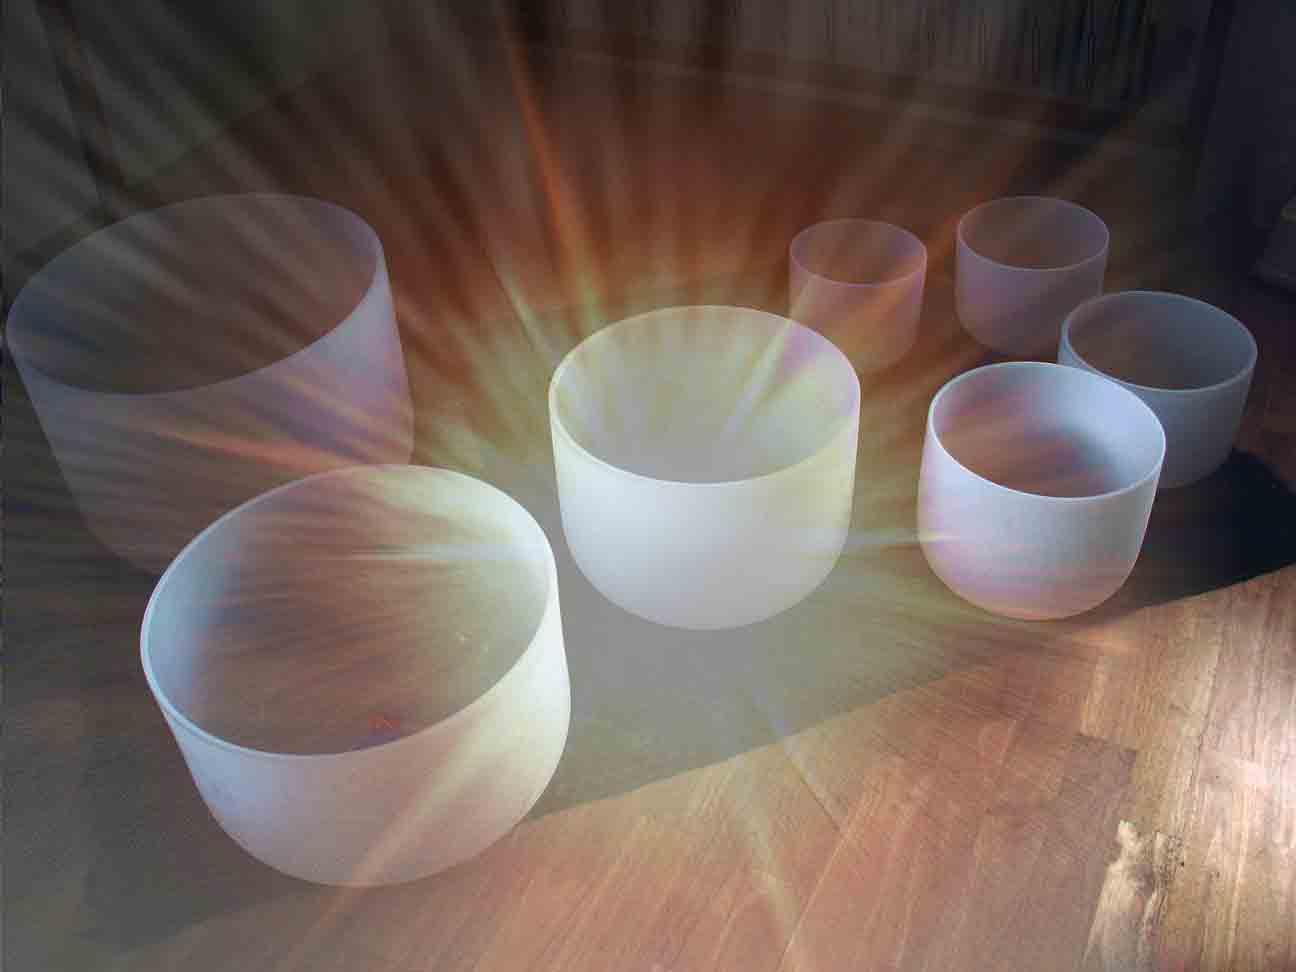 Frosted Crystal Bowl Chakra Sets - North Carolina Reiki ... Quartz Crystal Bowls